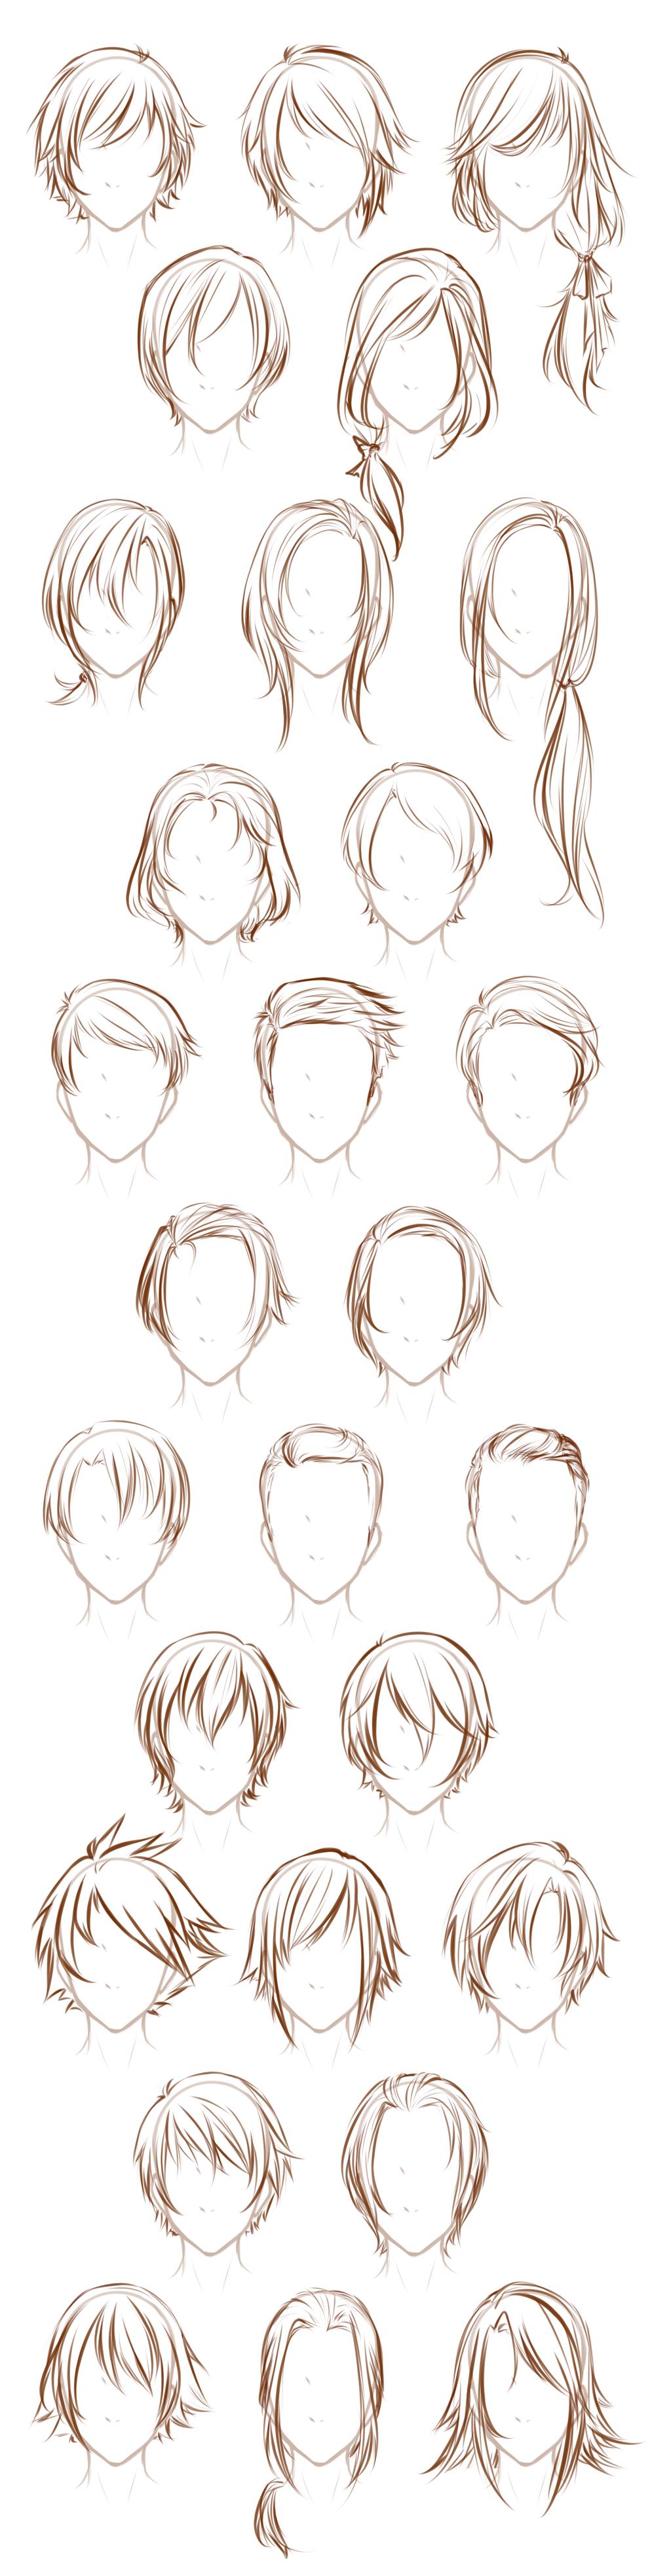 Dibujos De Peinados Tambien Para Hombre Drawins Animes